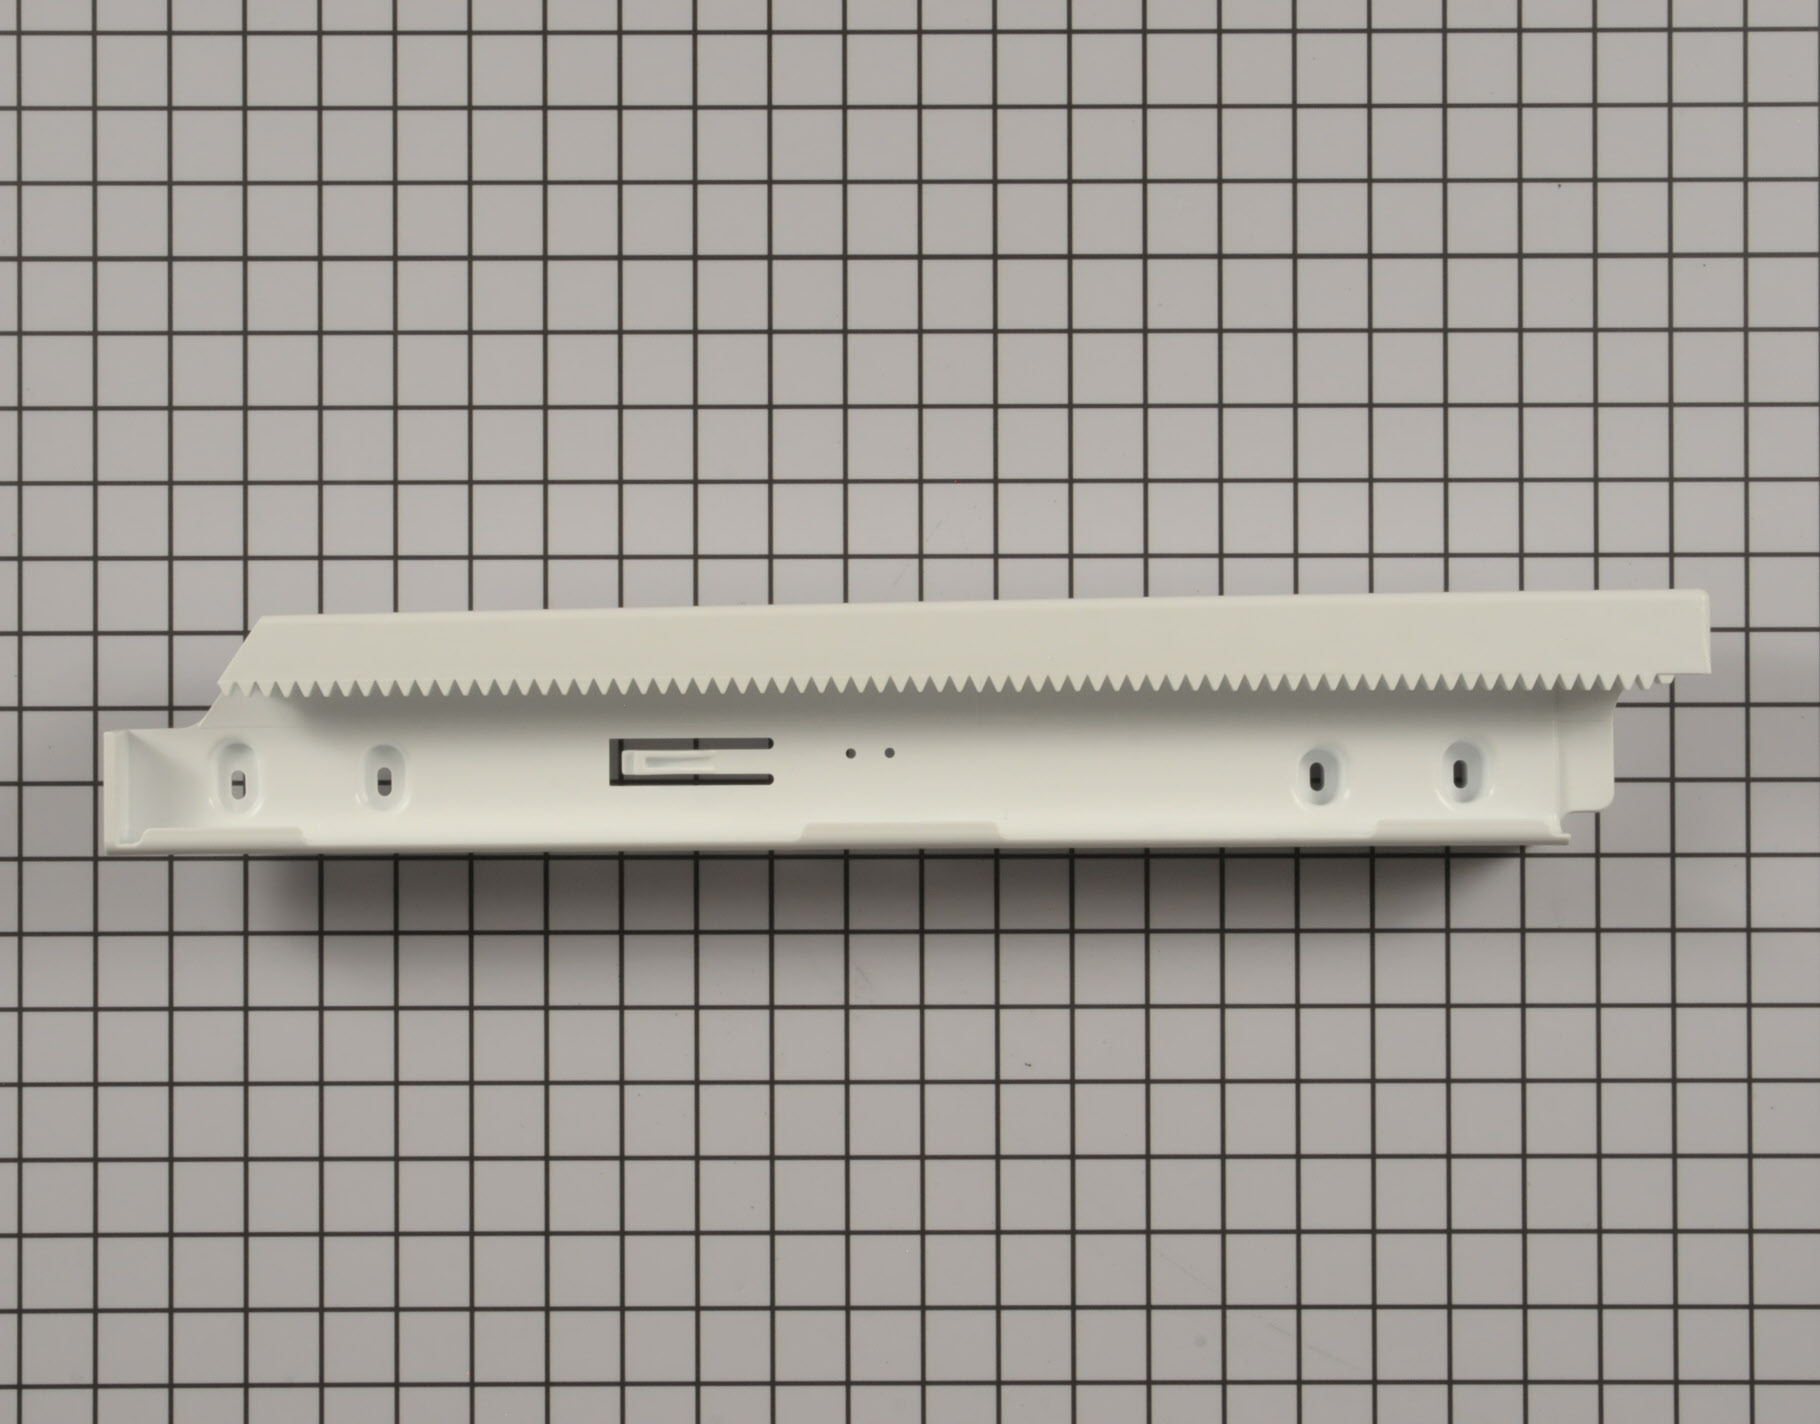 Maytag Refrigerator Part # WPW10284684 - Drawer Slide Rail